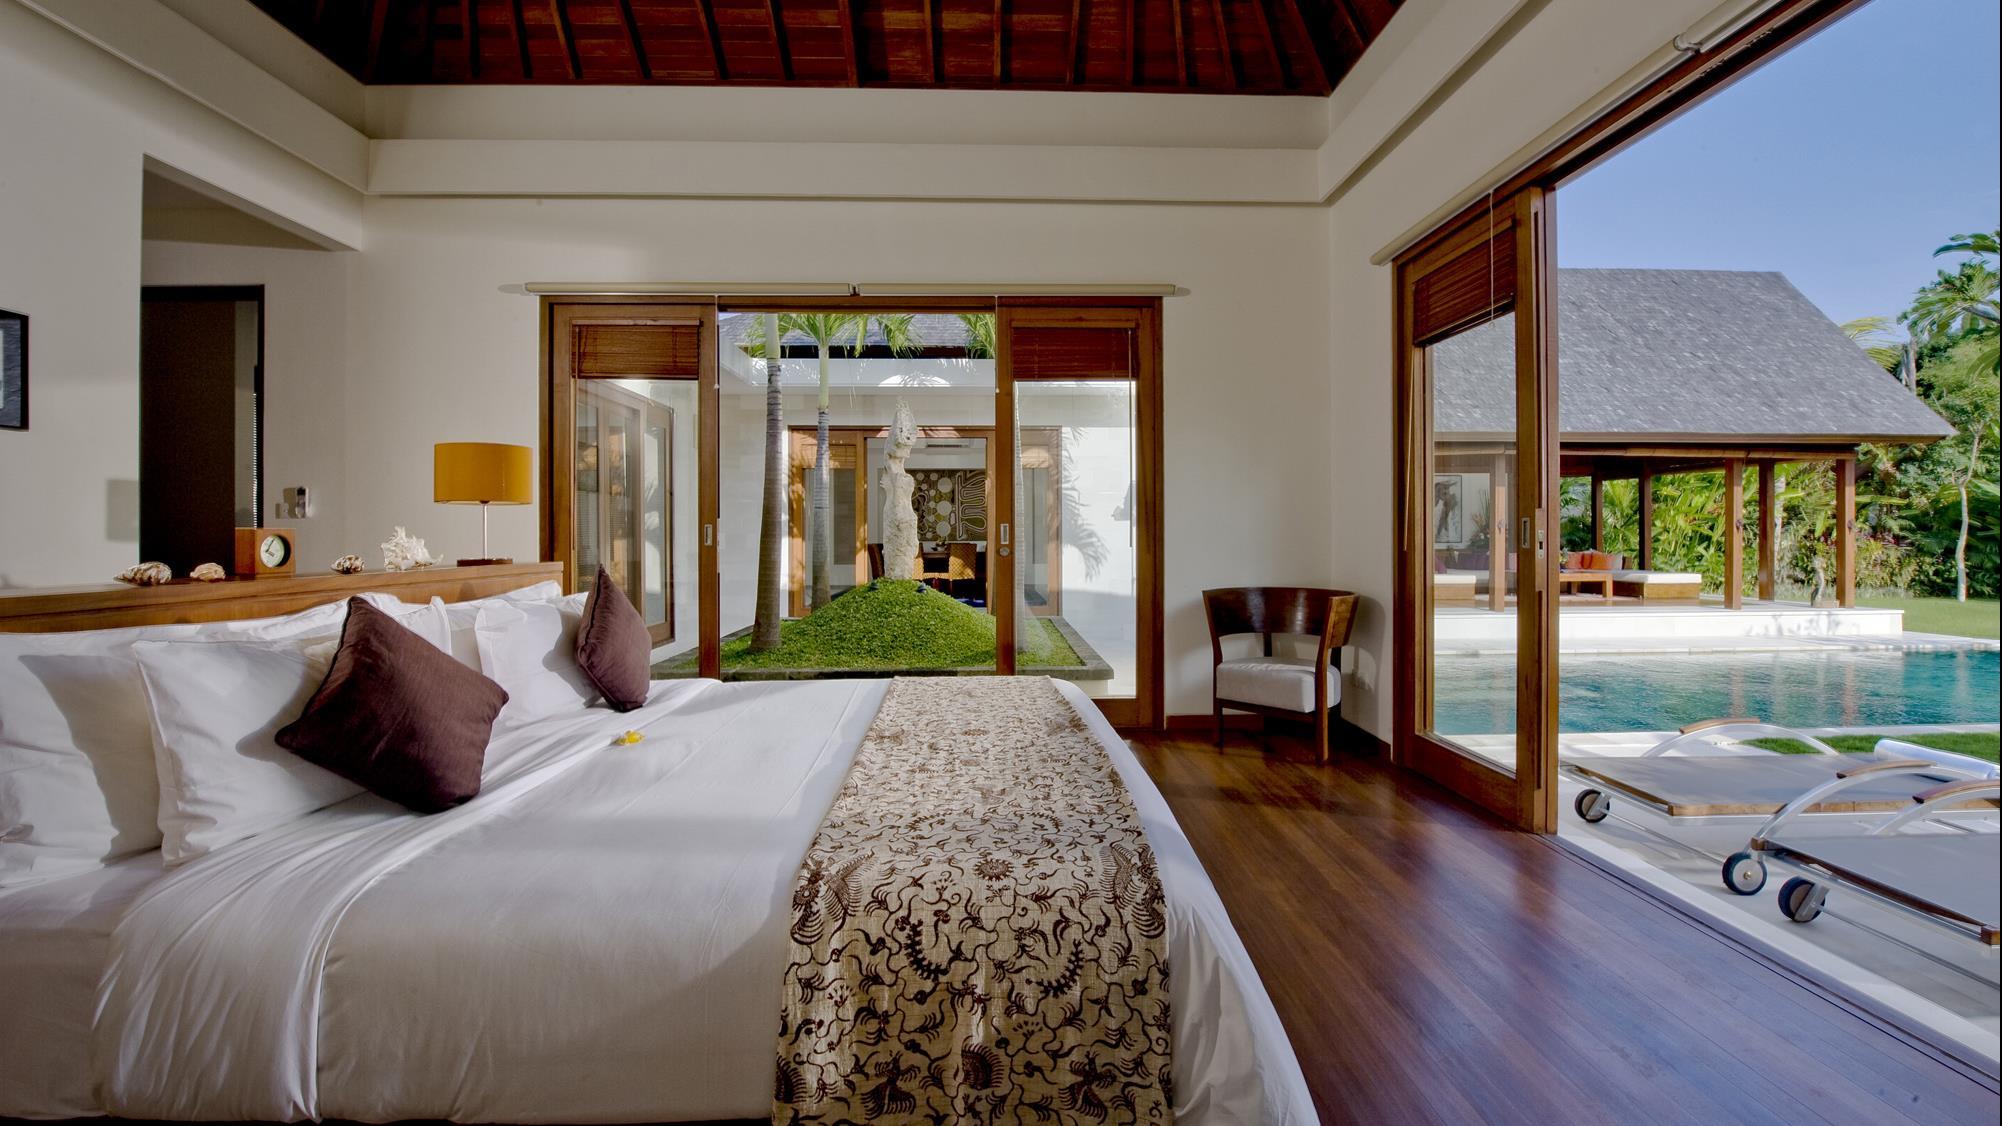 Bedroom with Pool View - Saba Villas Bali - Canggu, Bali